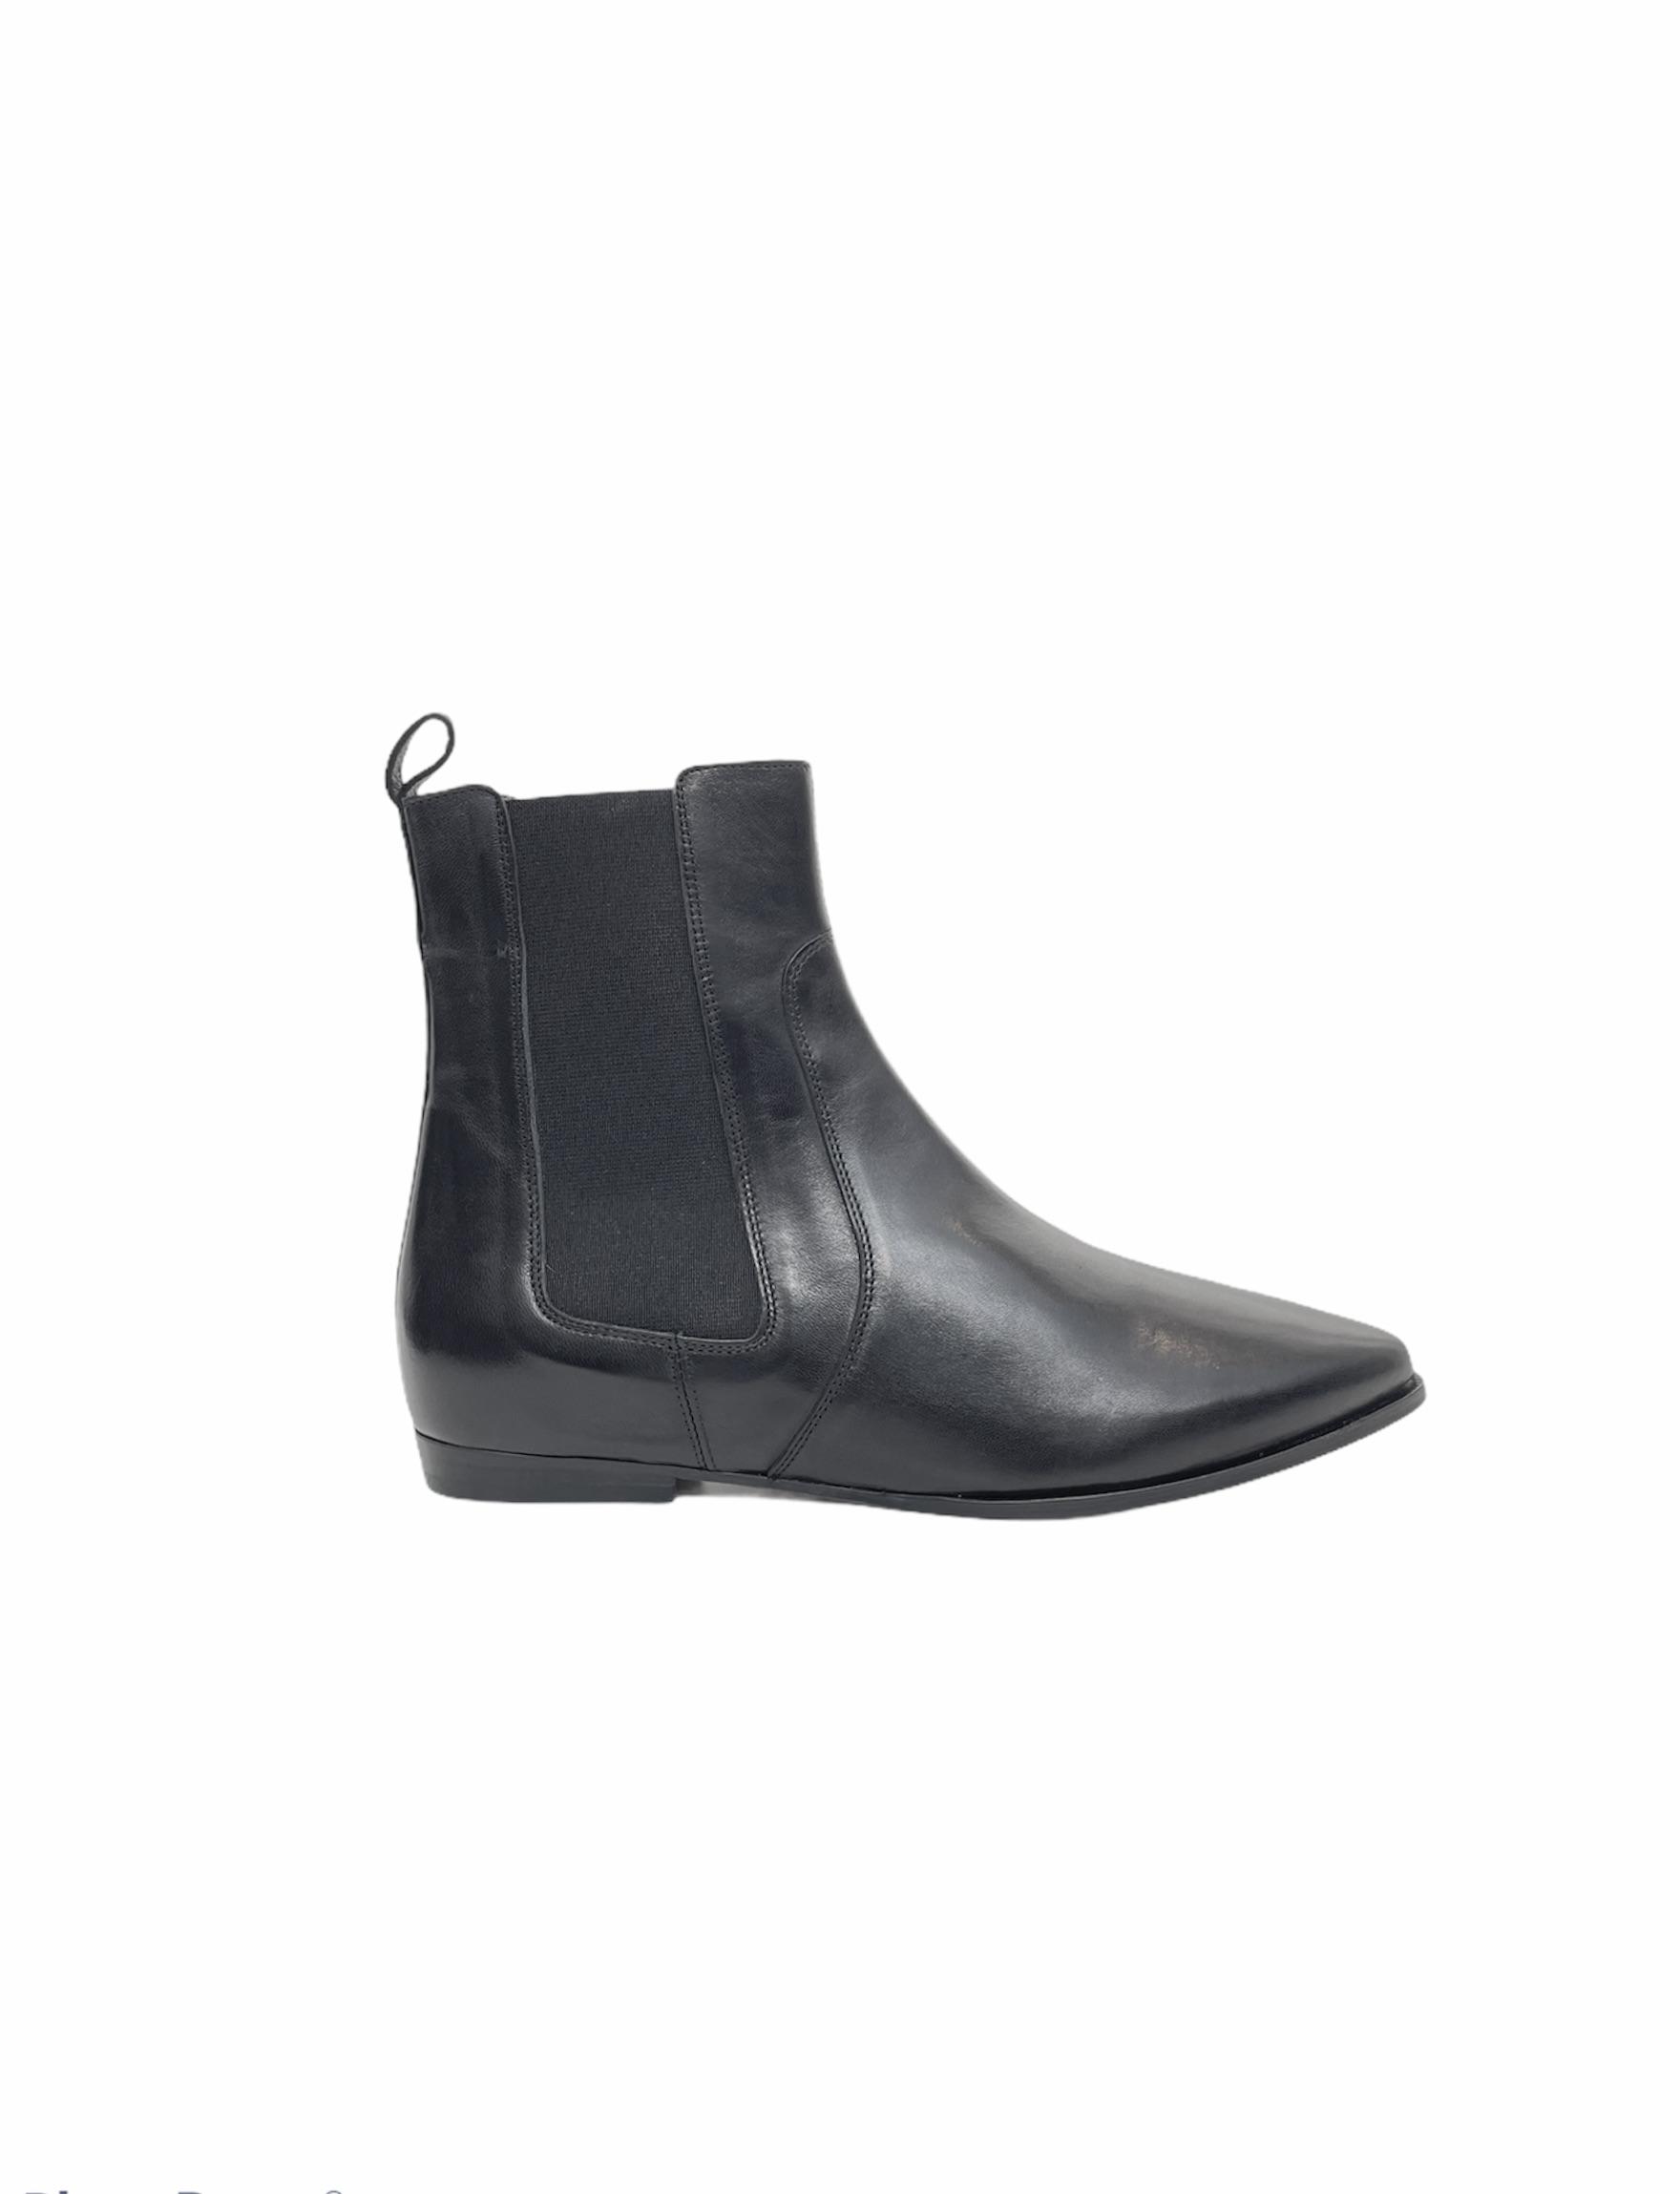 Boots, Duiza, Isabel Marant, Shoes